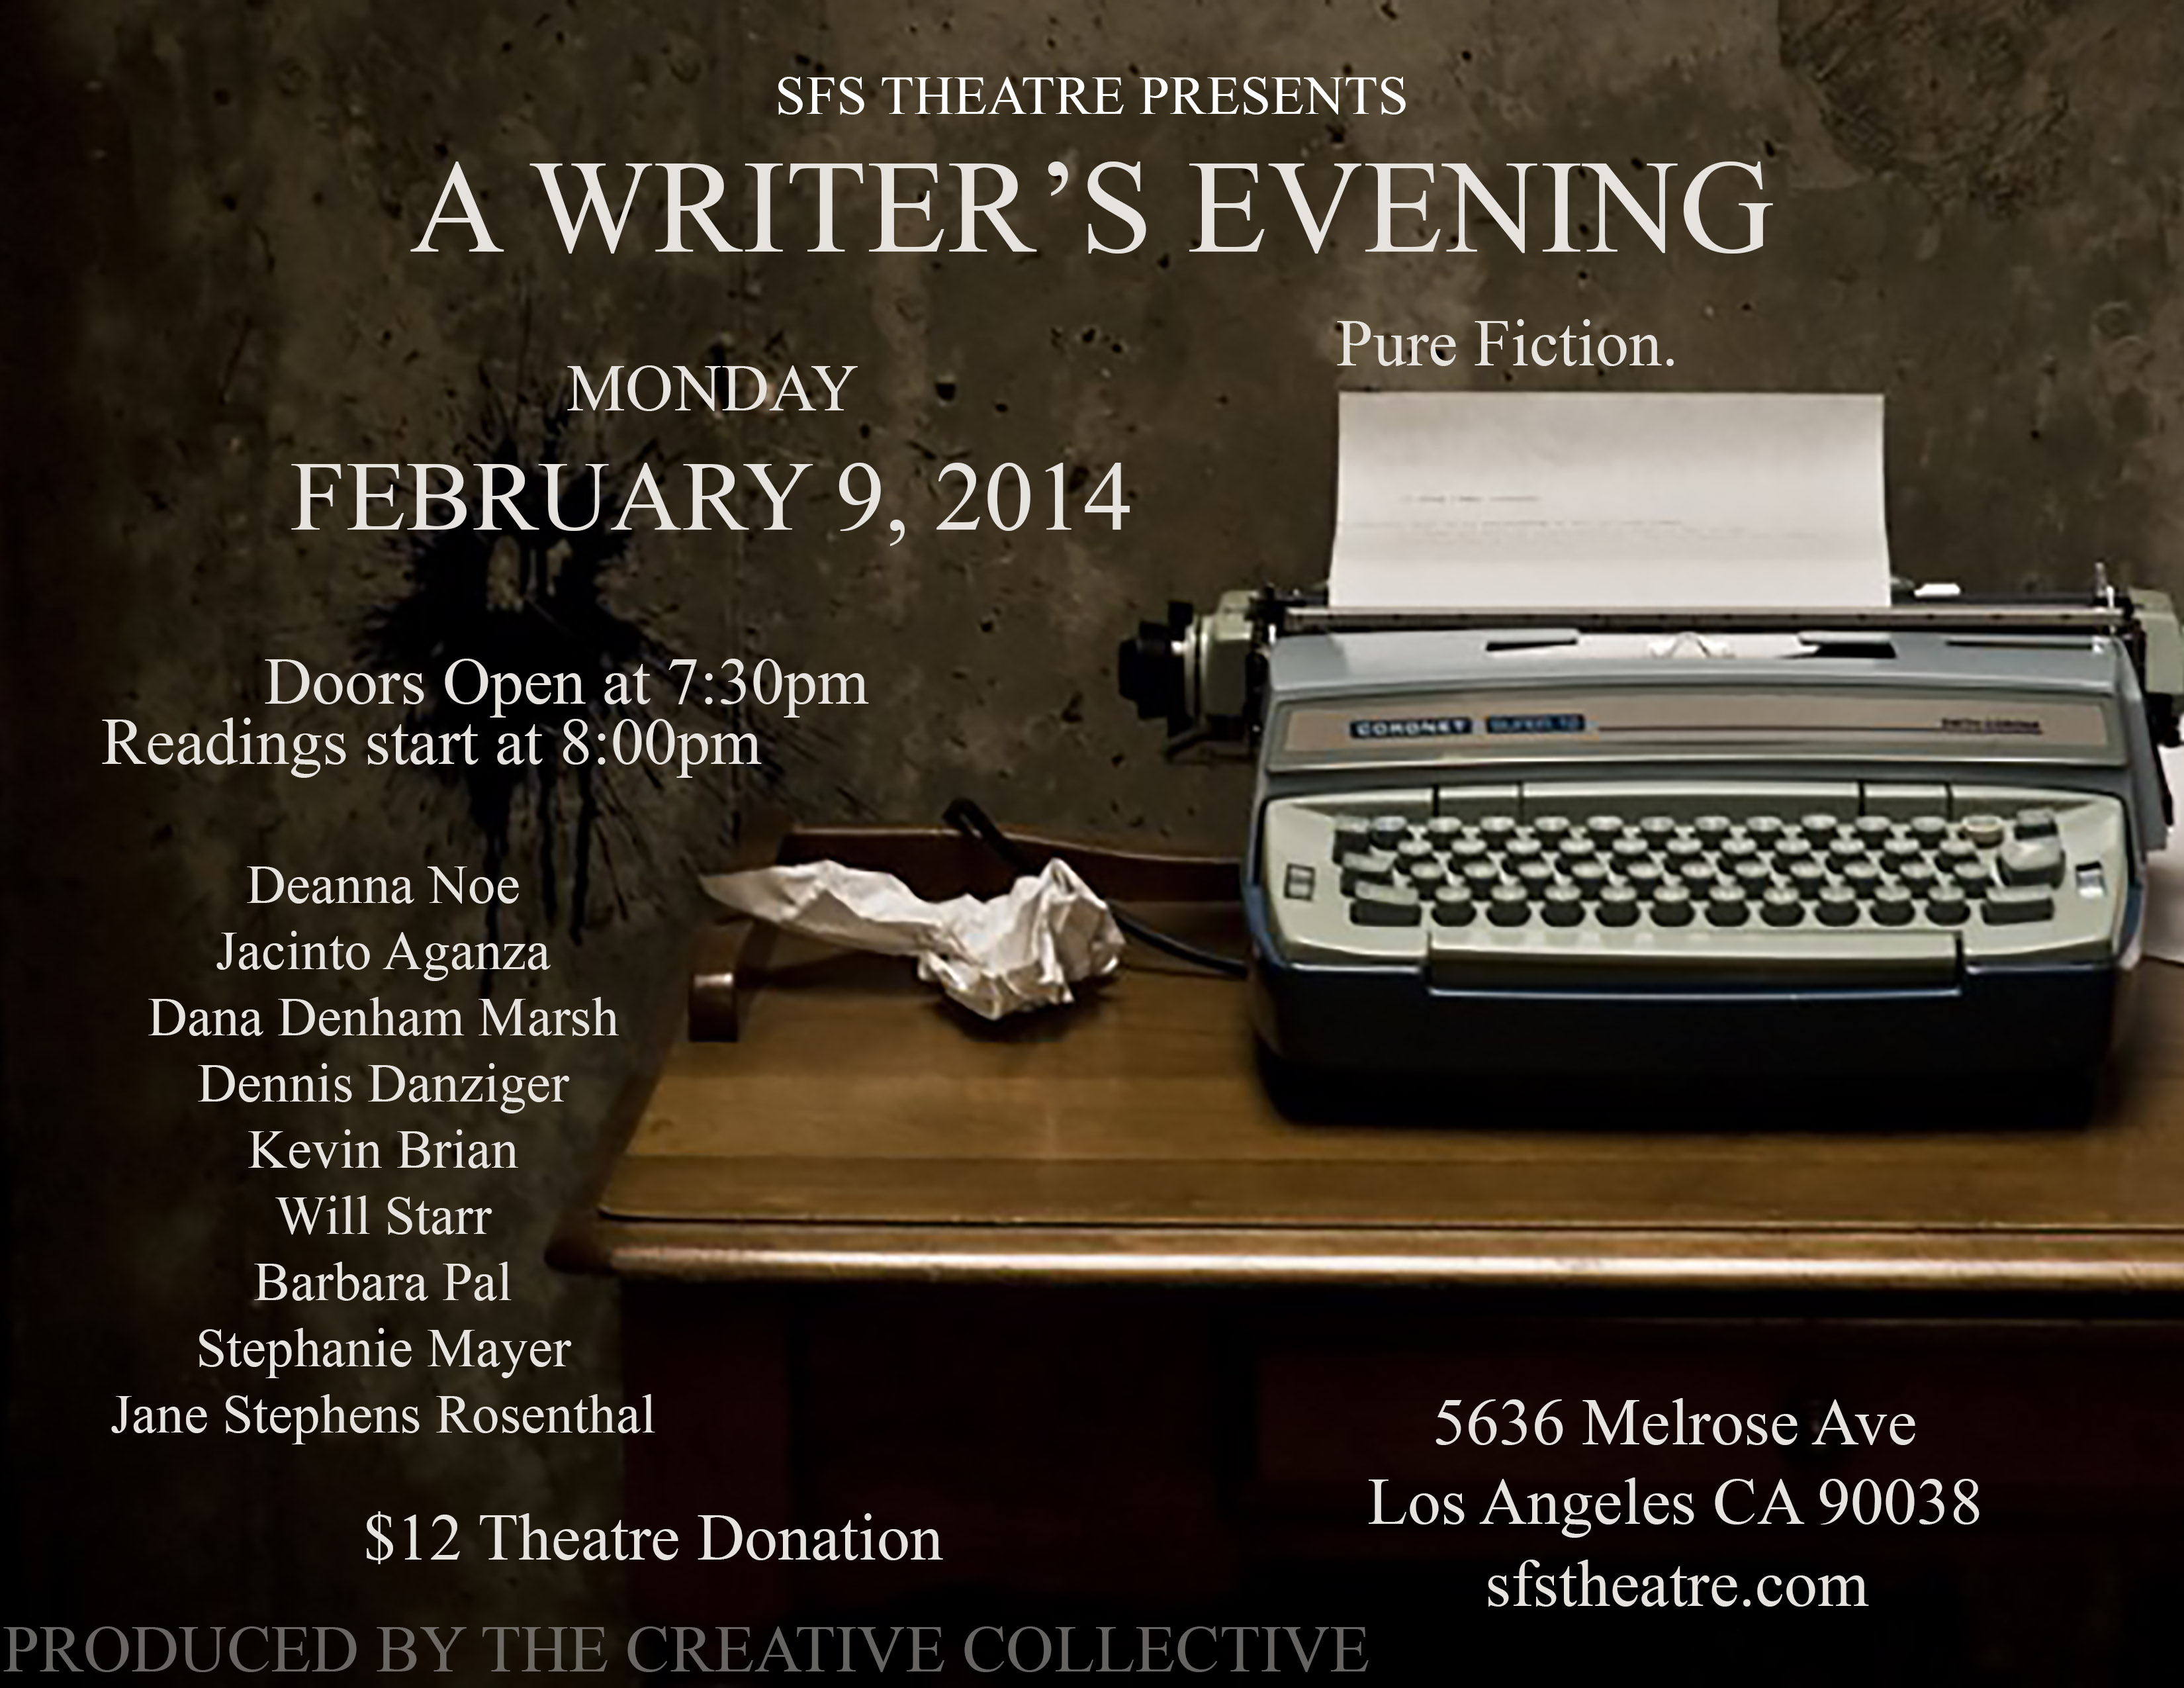 WritersEvening